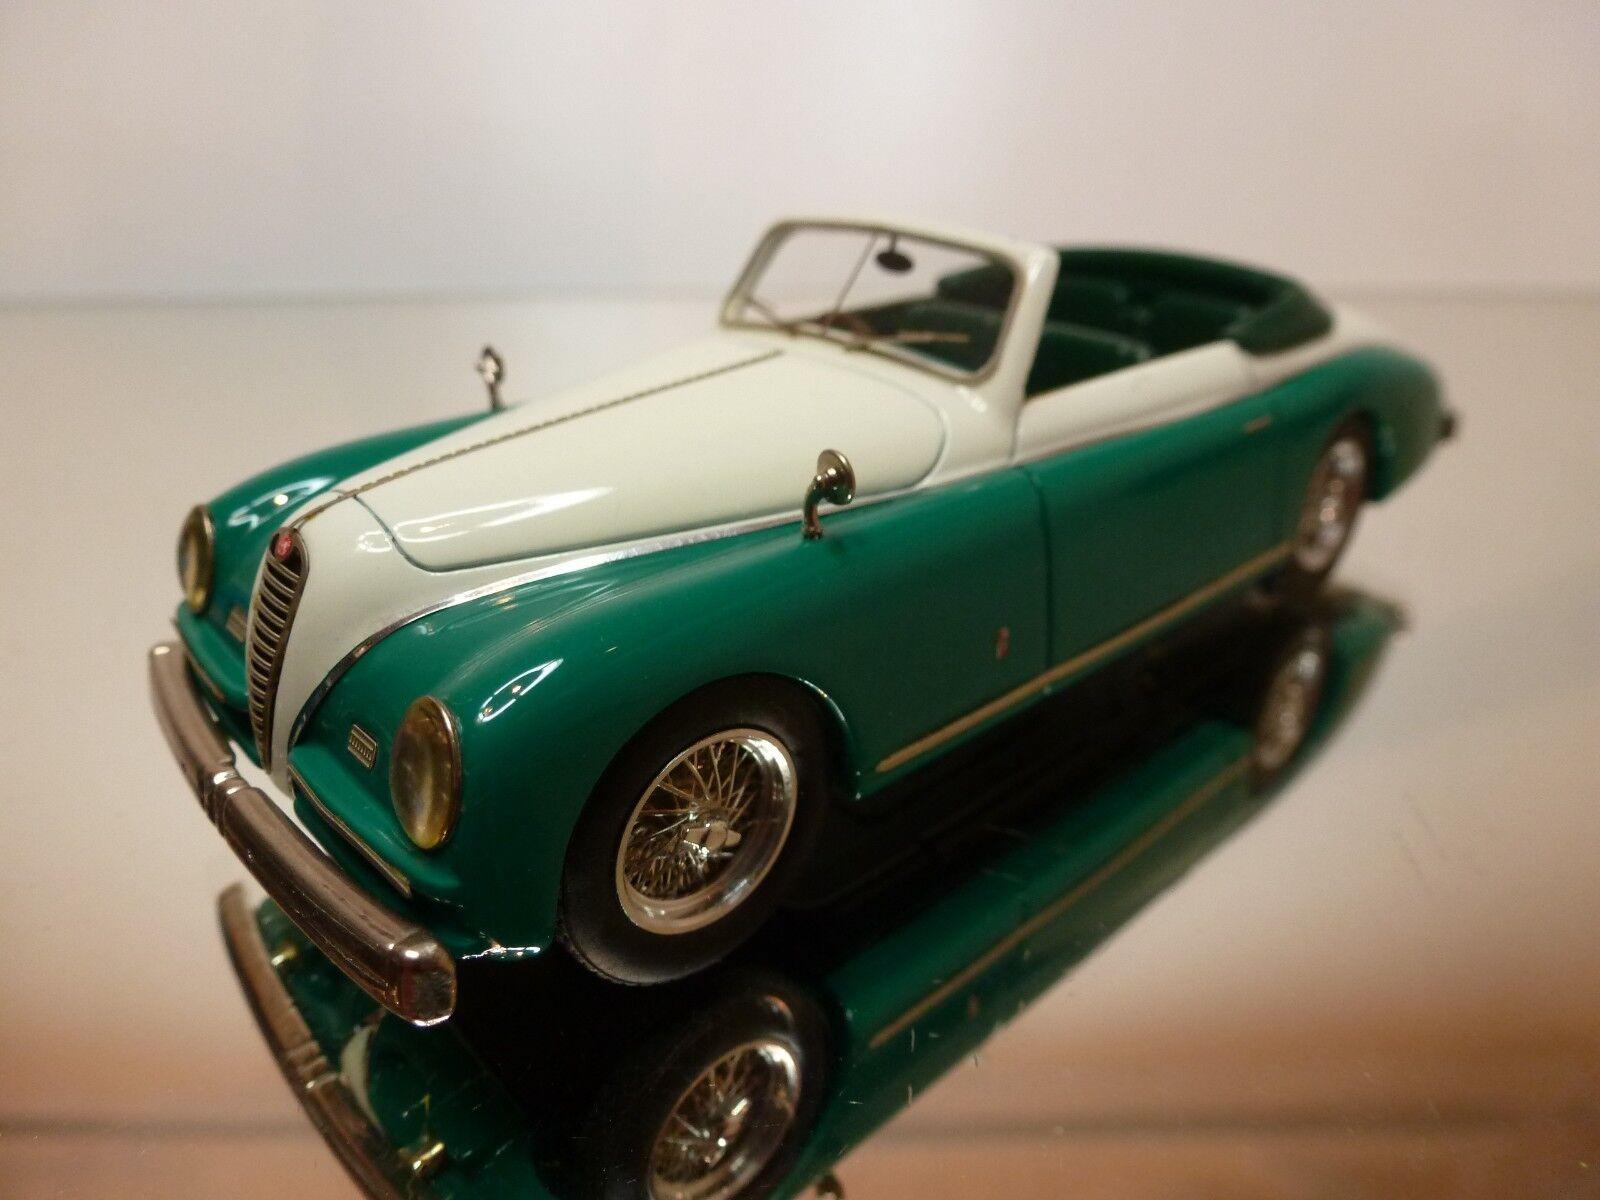 BBR  27 ALFA ROMEO 6C 2500 SS 1948 - verde + bianca 1 43 - EXCELLENT 13